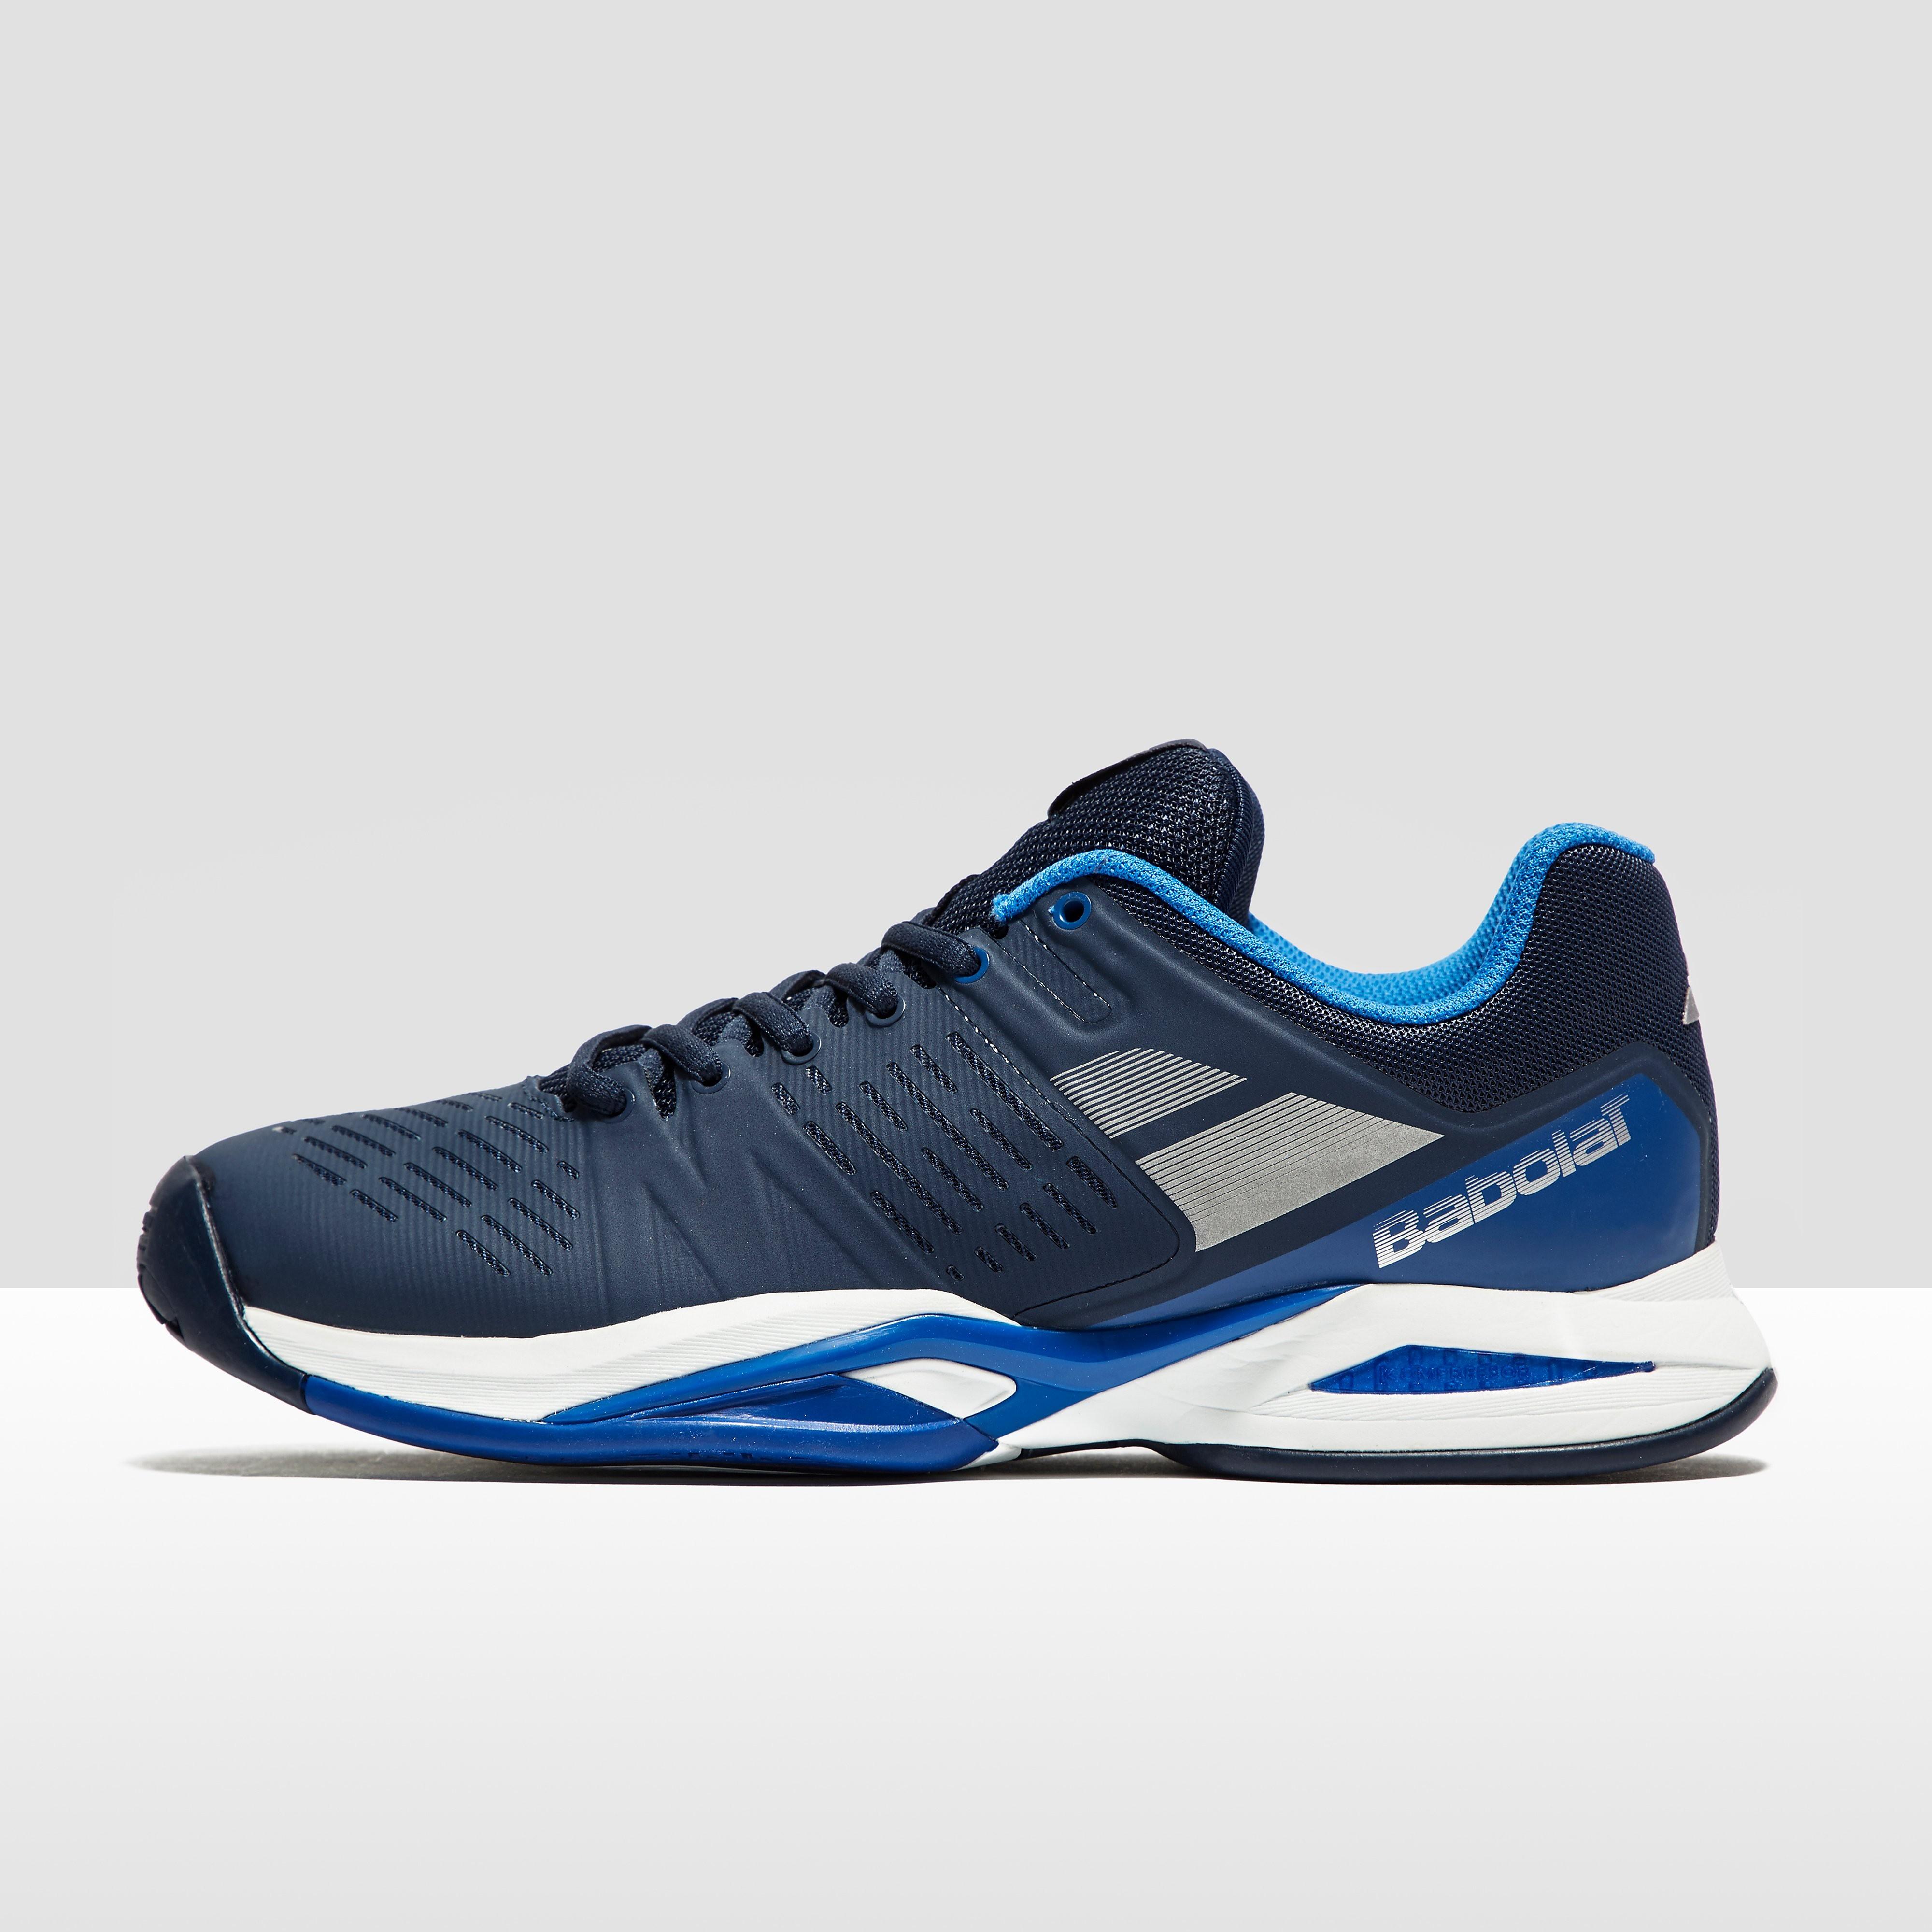 Babolat Propulse Team All Court Men's Tennis Shoes